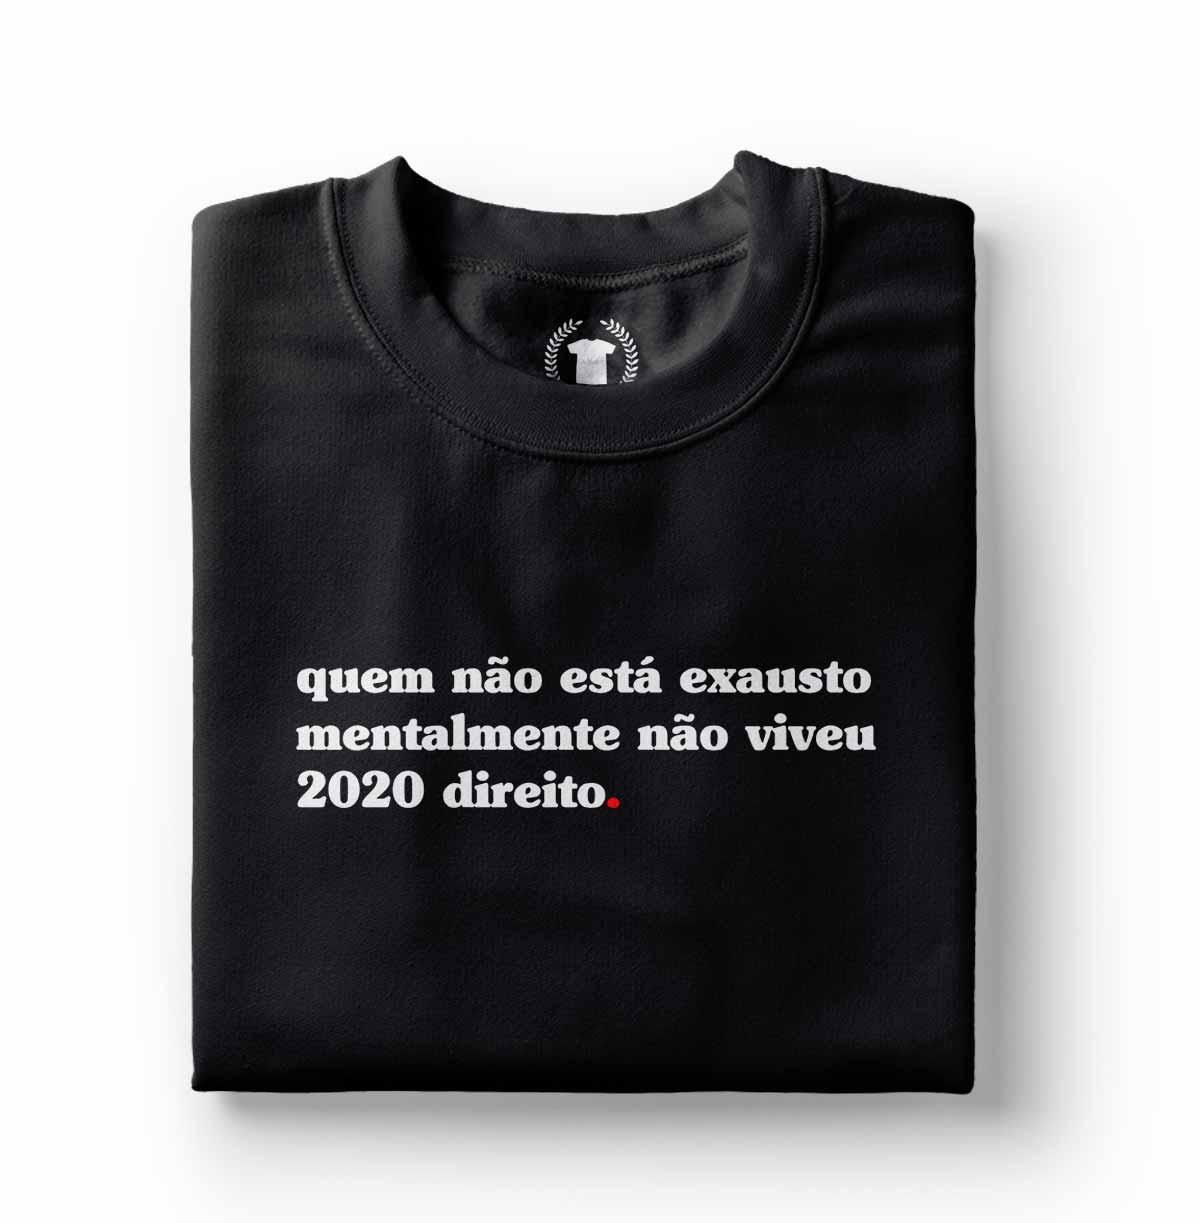 Camiseta Humor Pandemia Quem nao esta exausto 2020